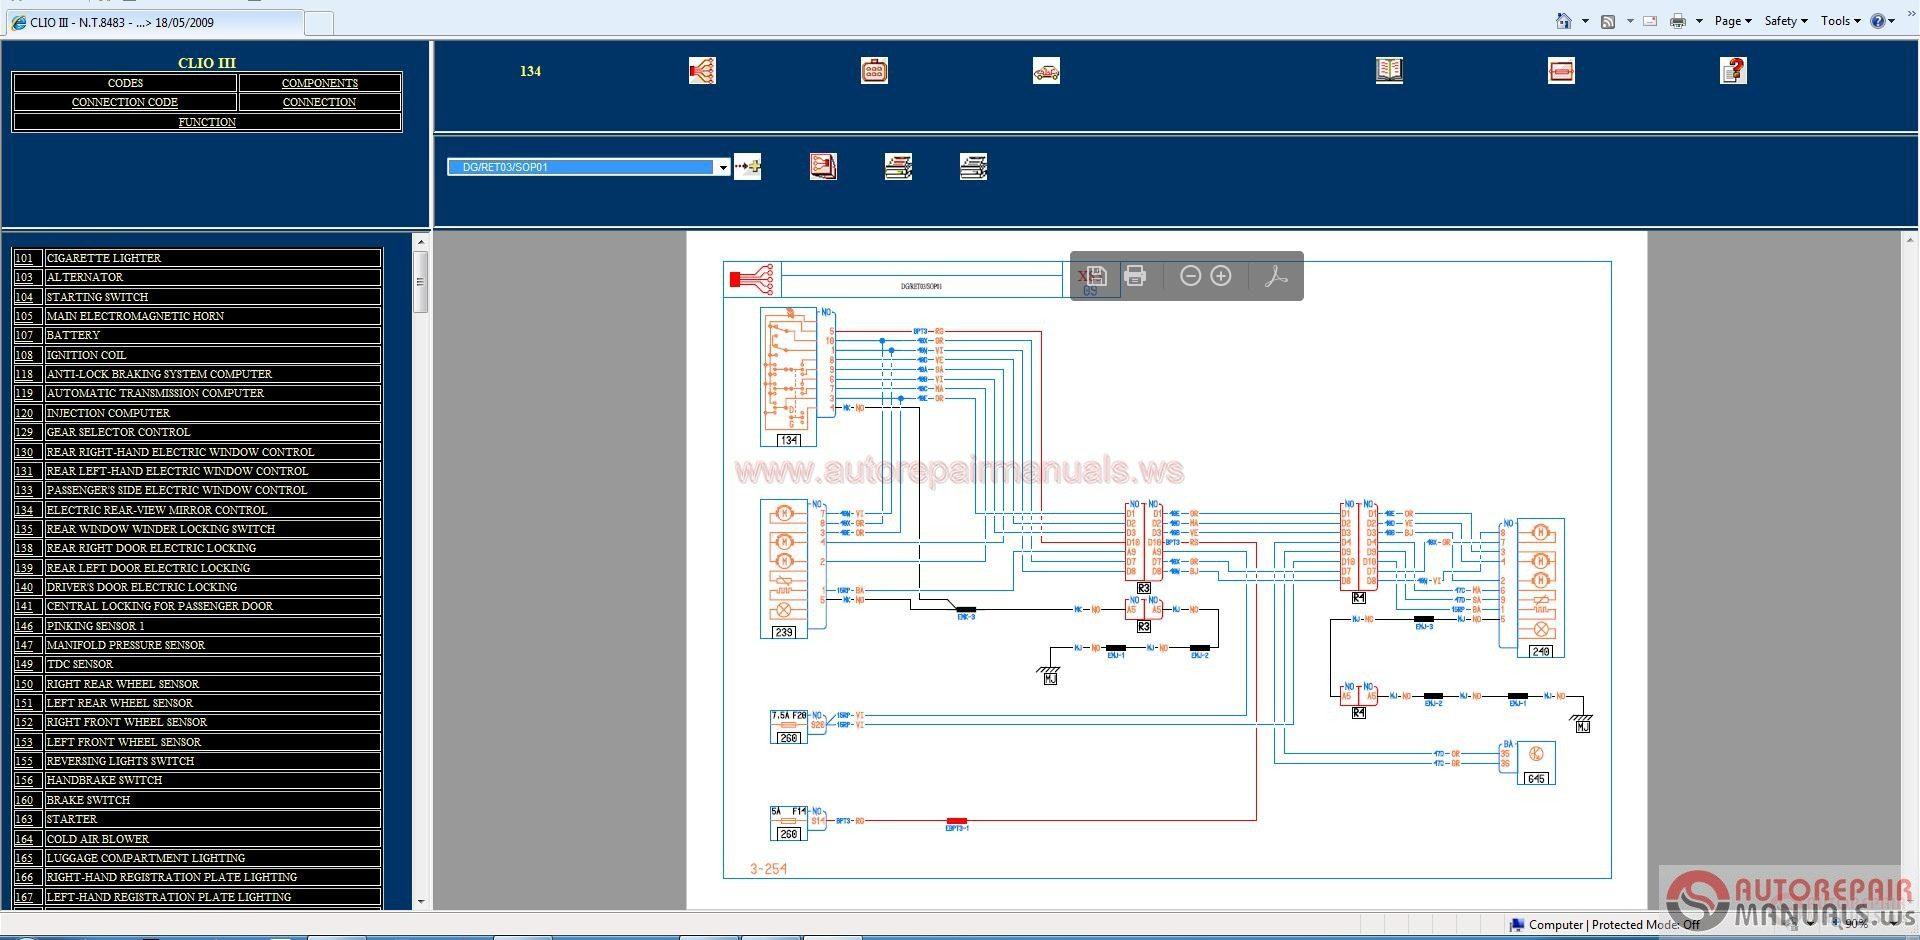 Renault Wiring Diagrams 1998 2014 All Model Full Dvd Auto Repair International 254 Diagram Software Epc Manual Workshop Service